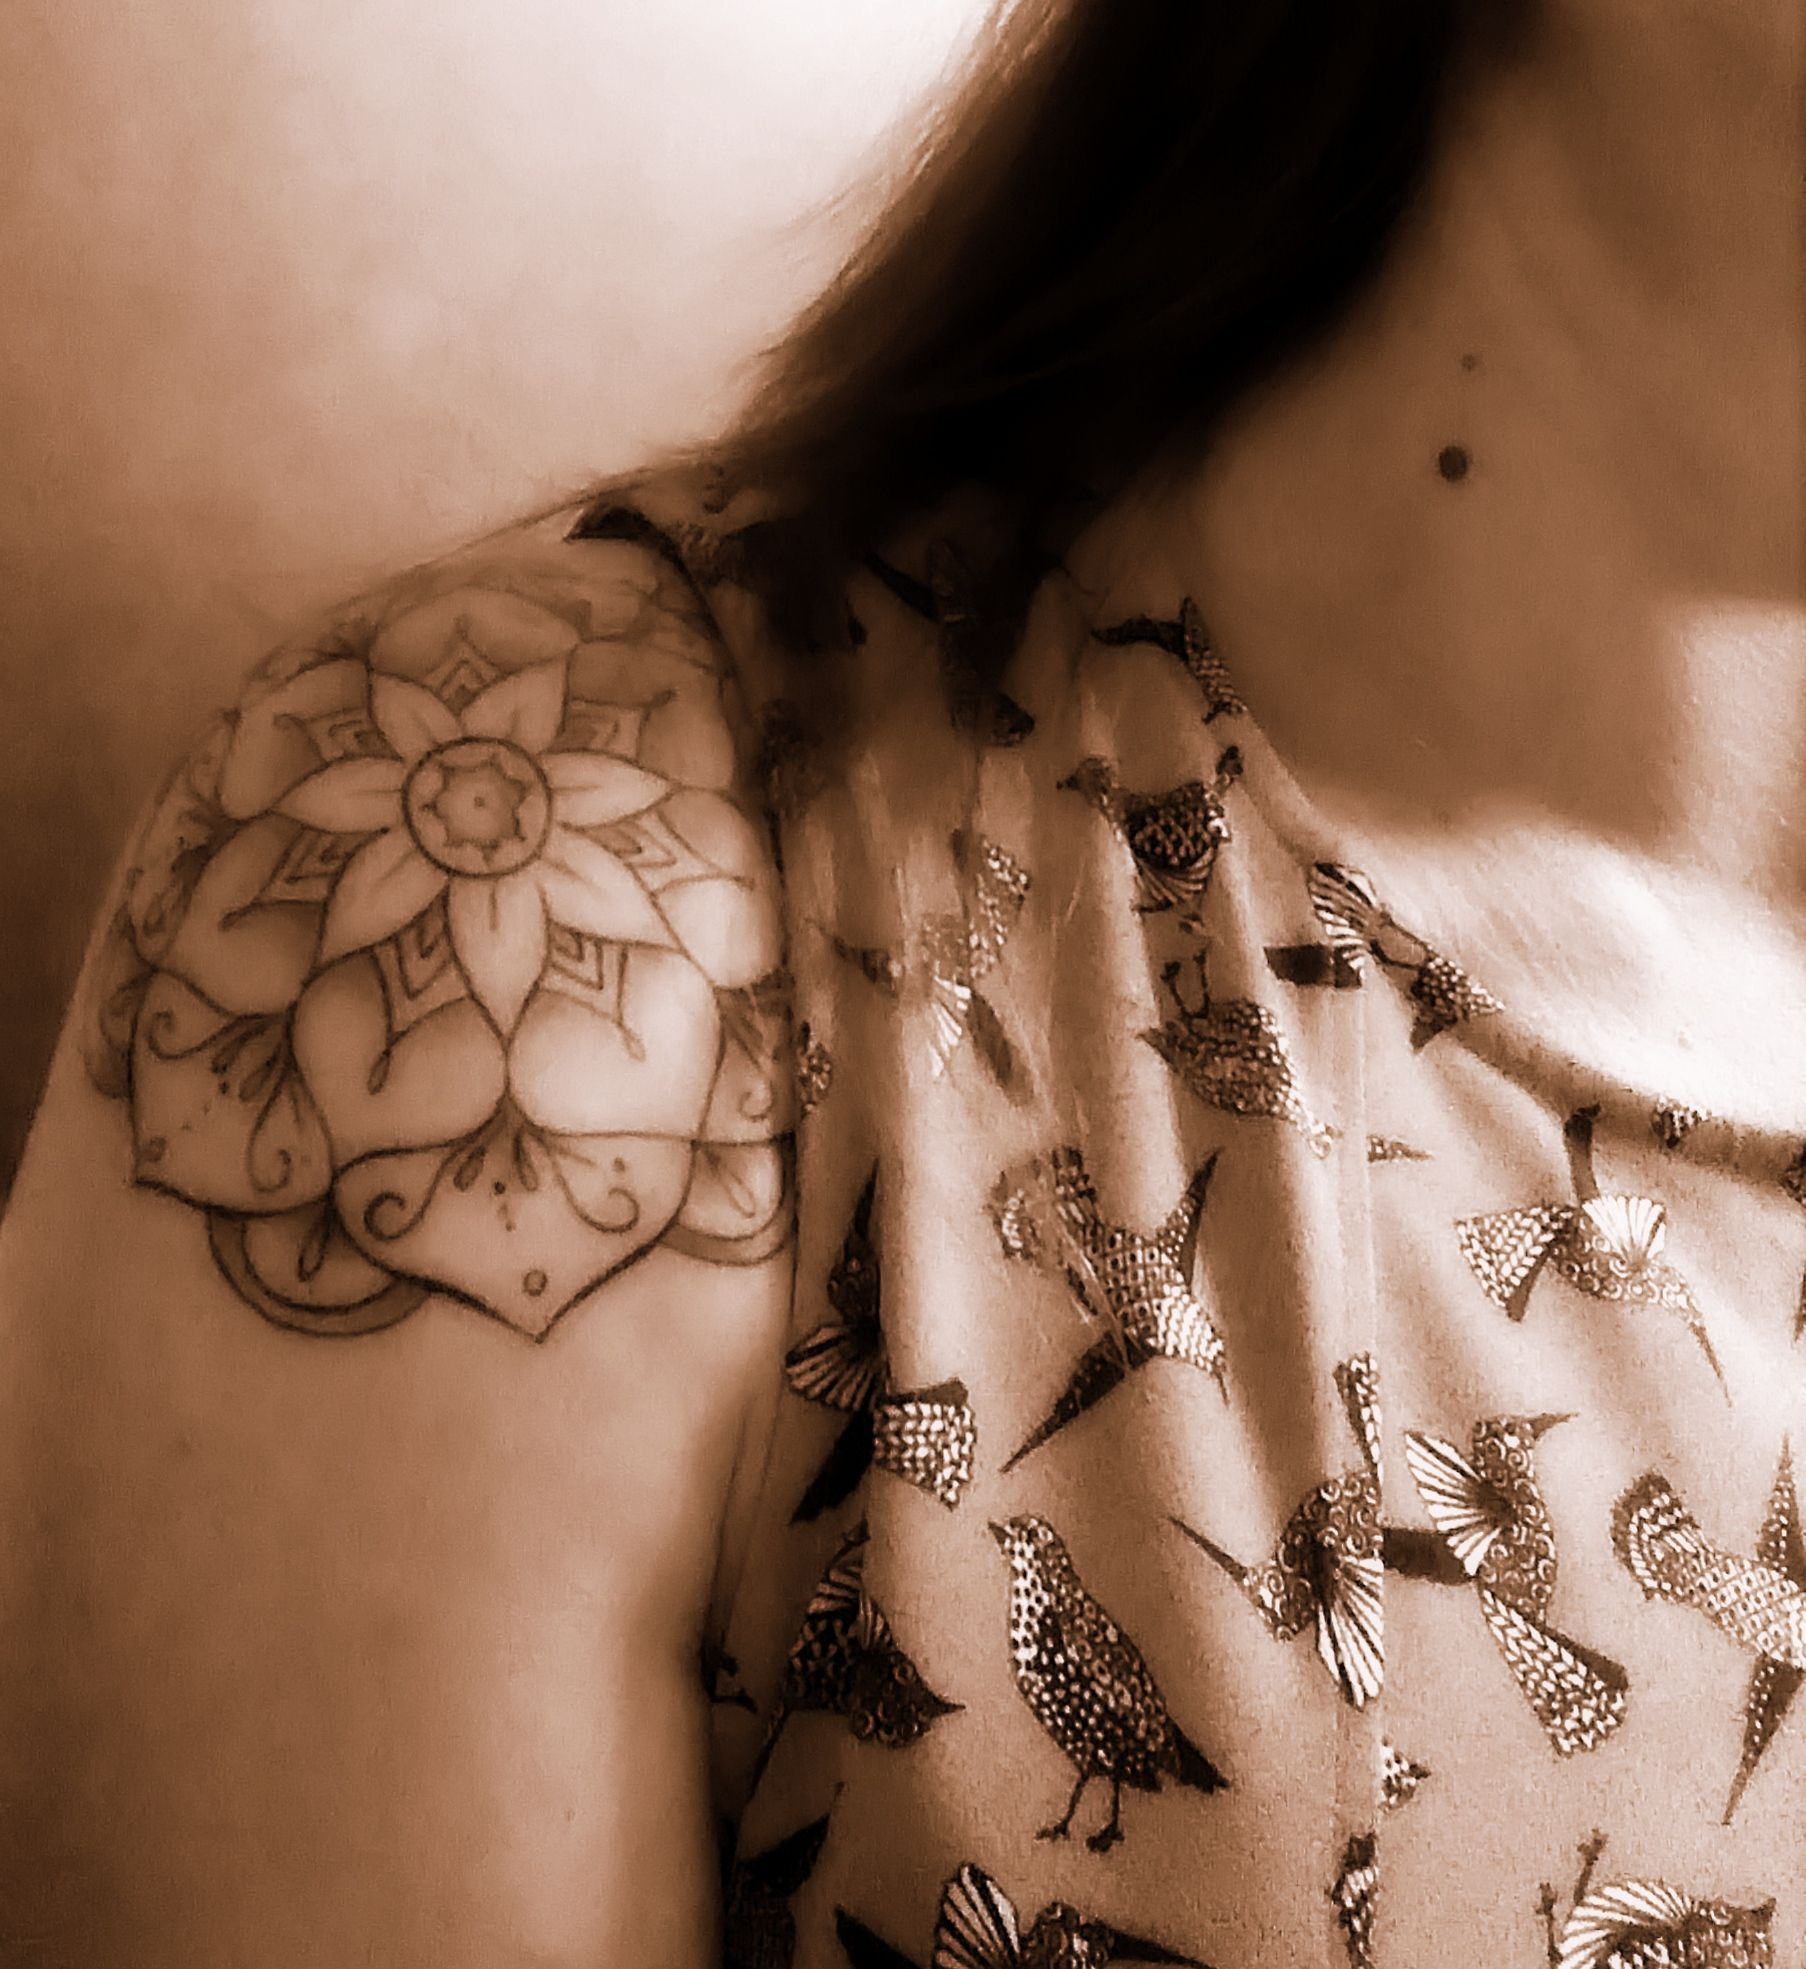 1 2 Sleeve Tattoo Epaule Femme Roses Images For Tatouage